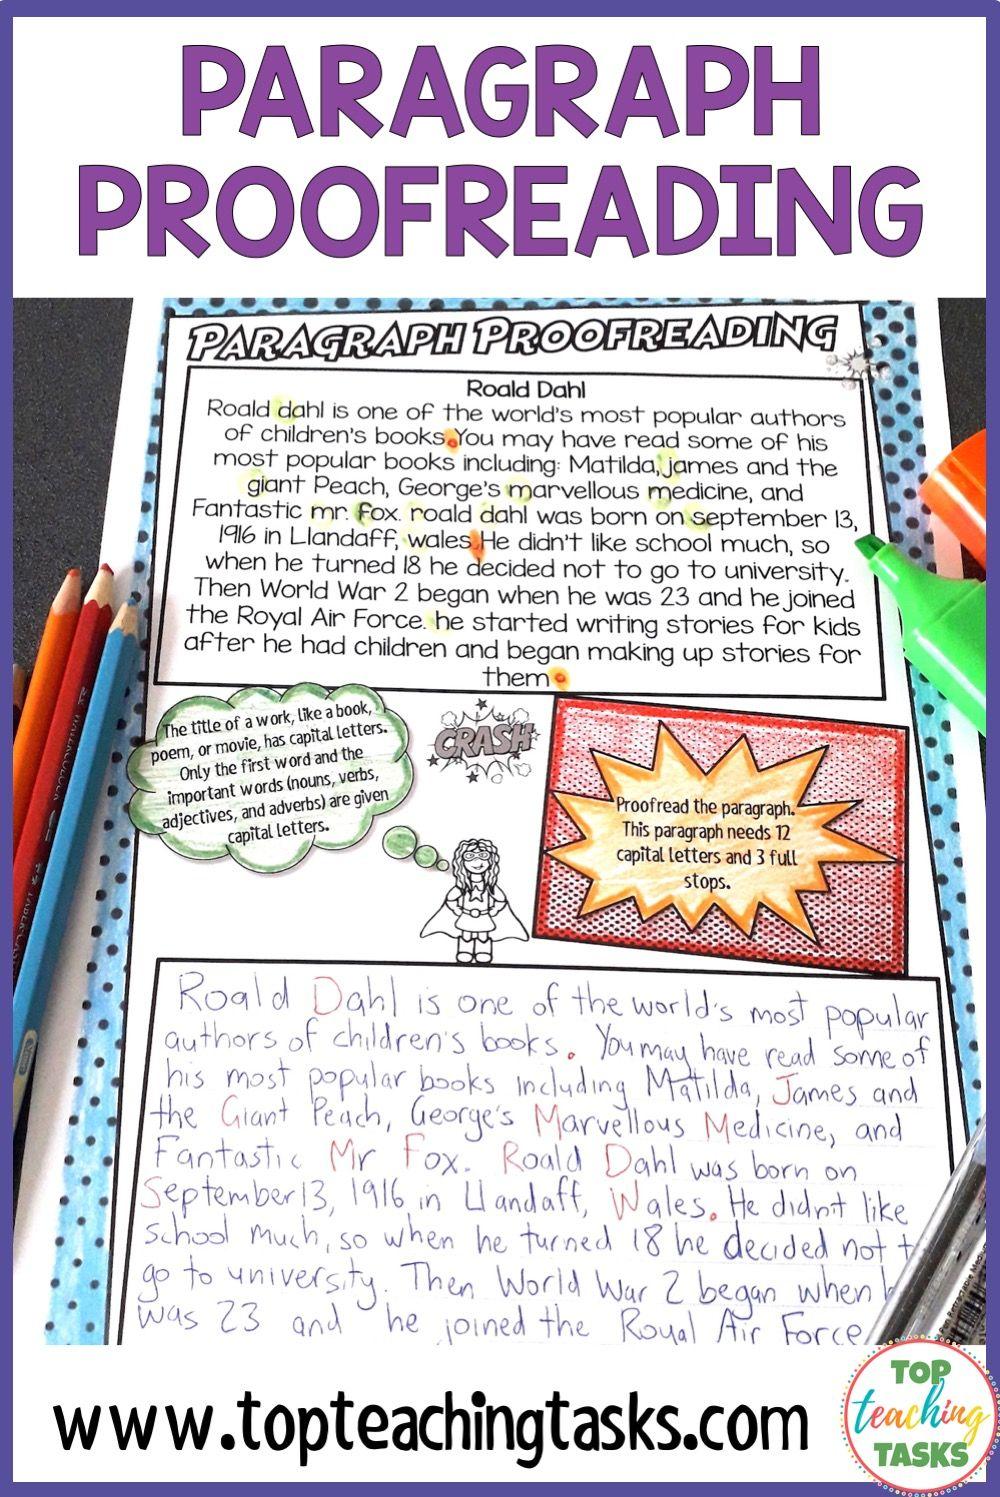 3 Worksheet Free Grammar Worksheets Fifth Grade 5 Punctuation Quotation Marks Quotation M Grammar Worksheets Punctuation Quotation Marks Punctuation Worksheets